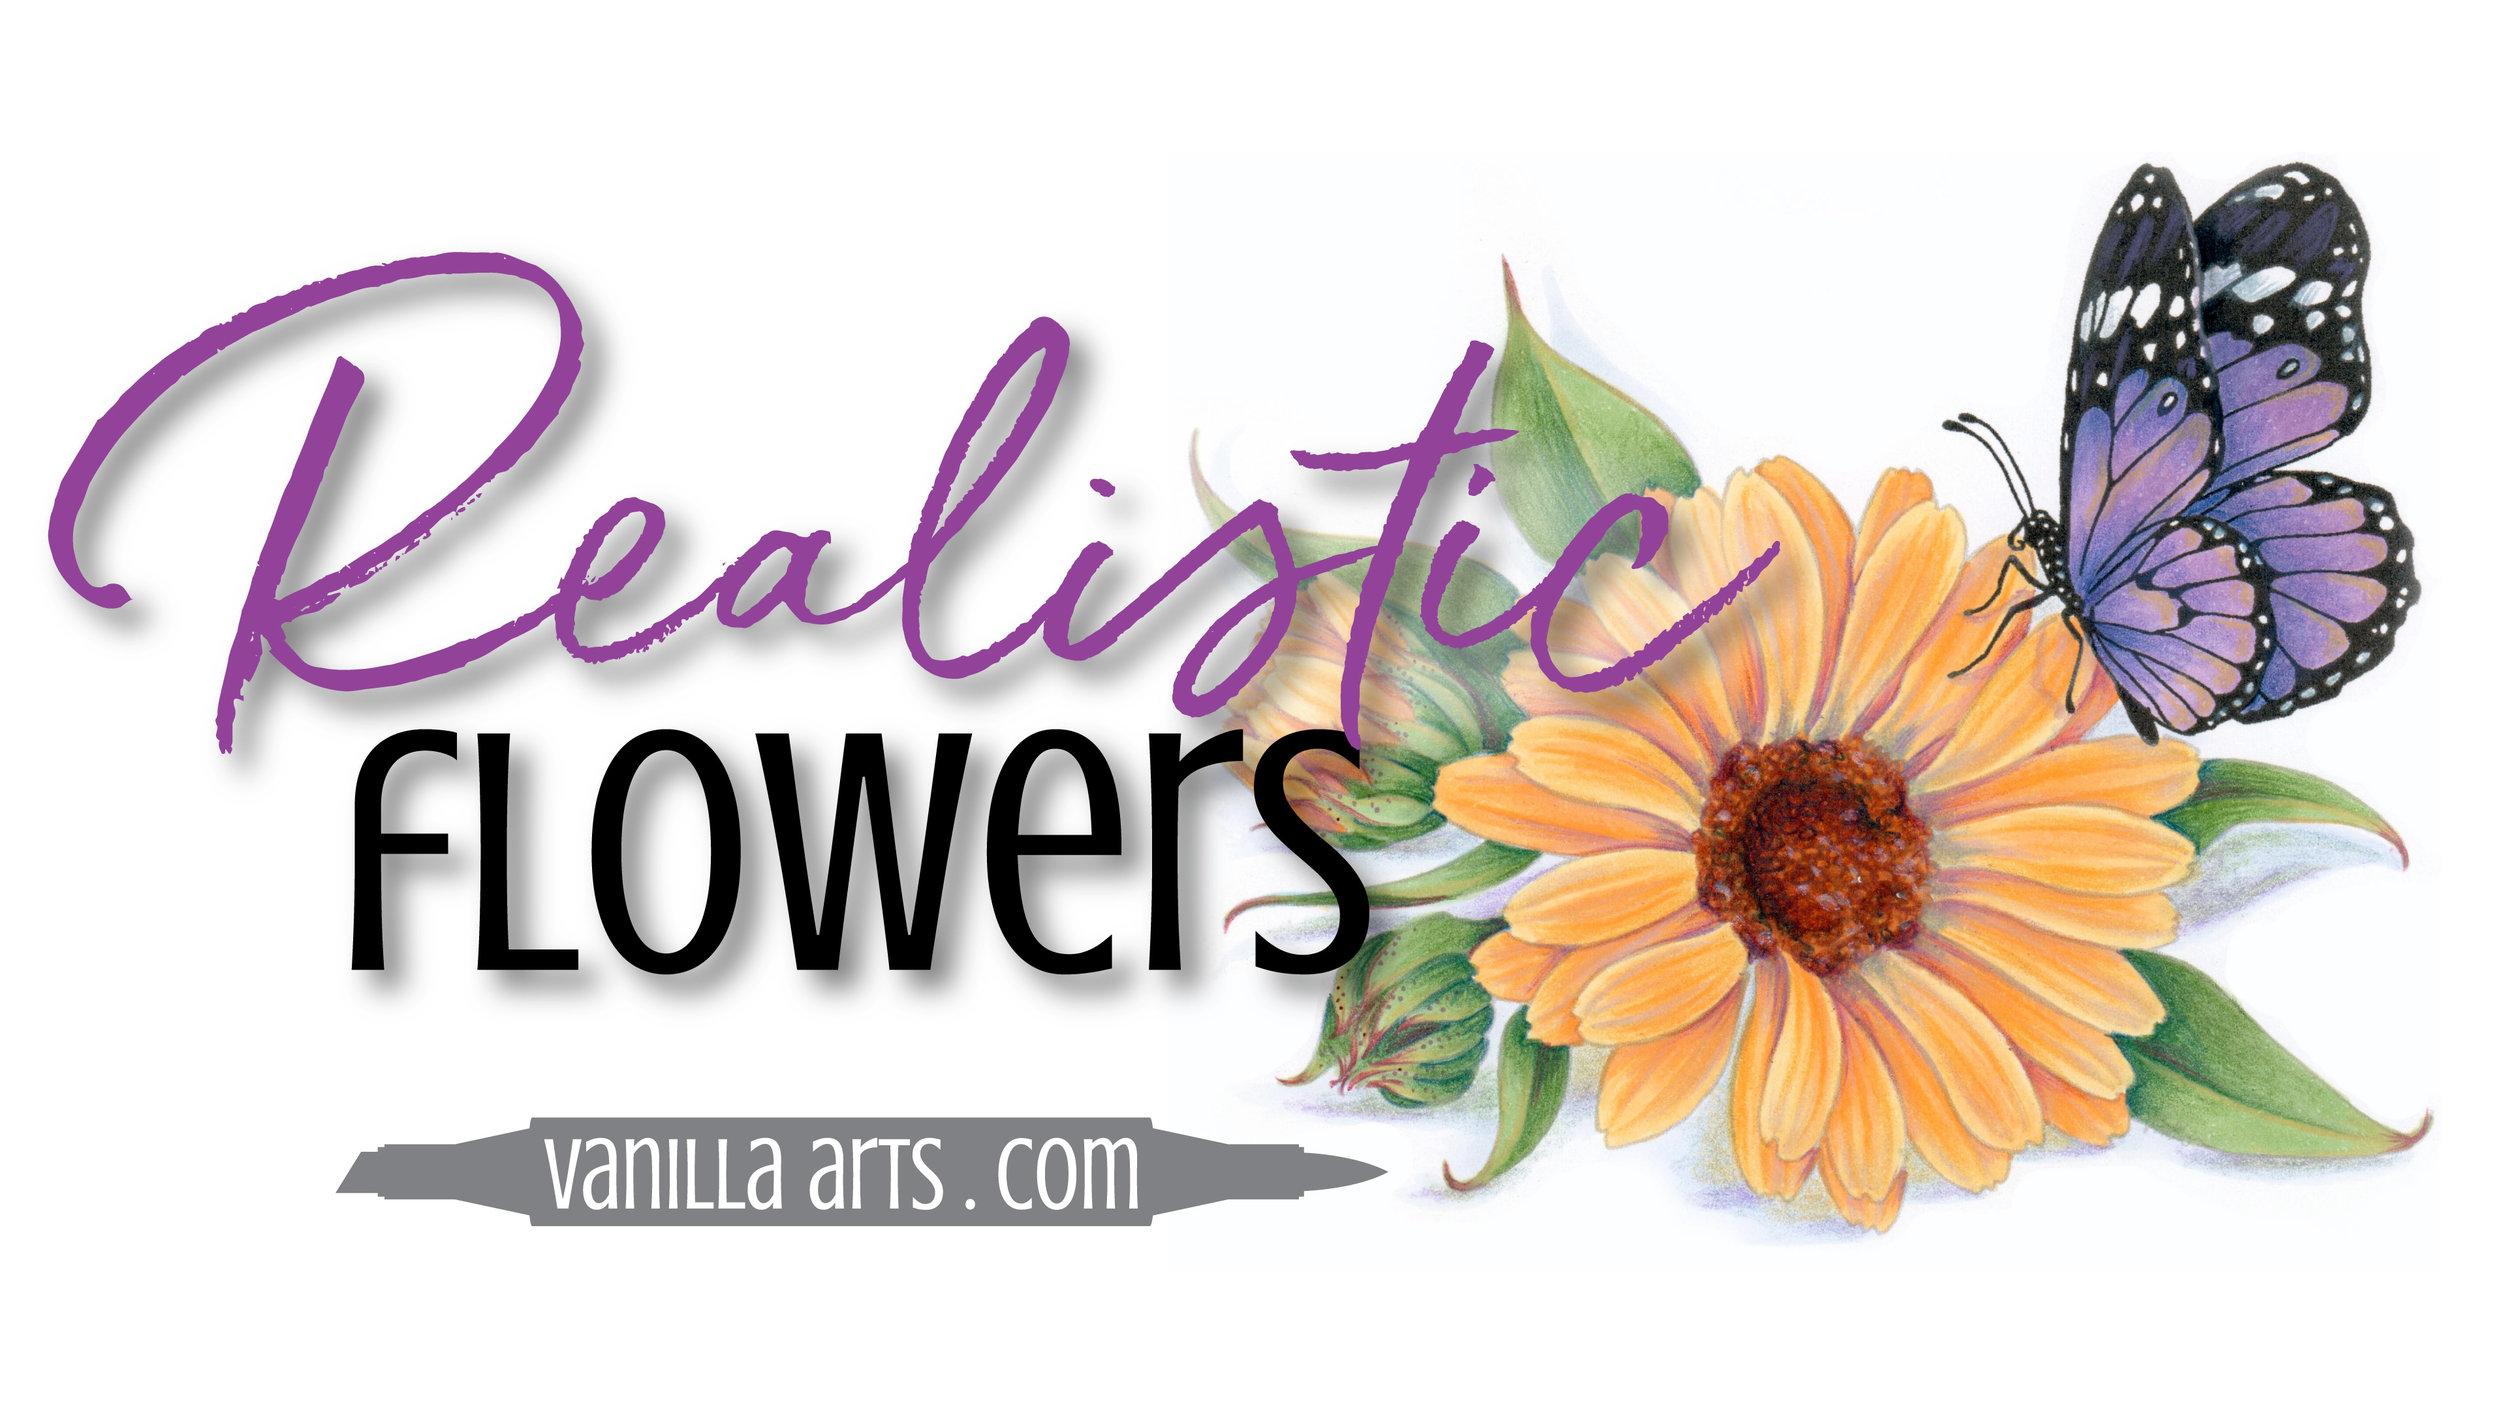 Copic Blending leads to Fake looking Flowers   VanillaArts.com